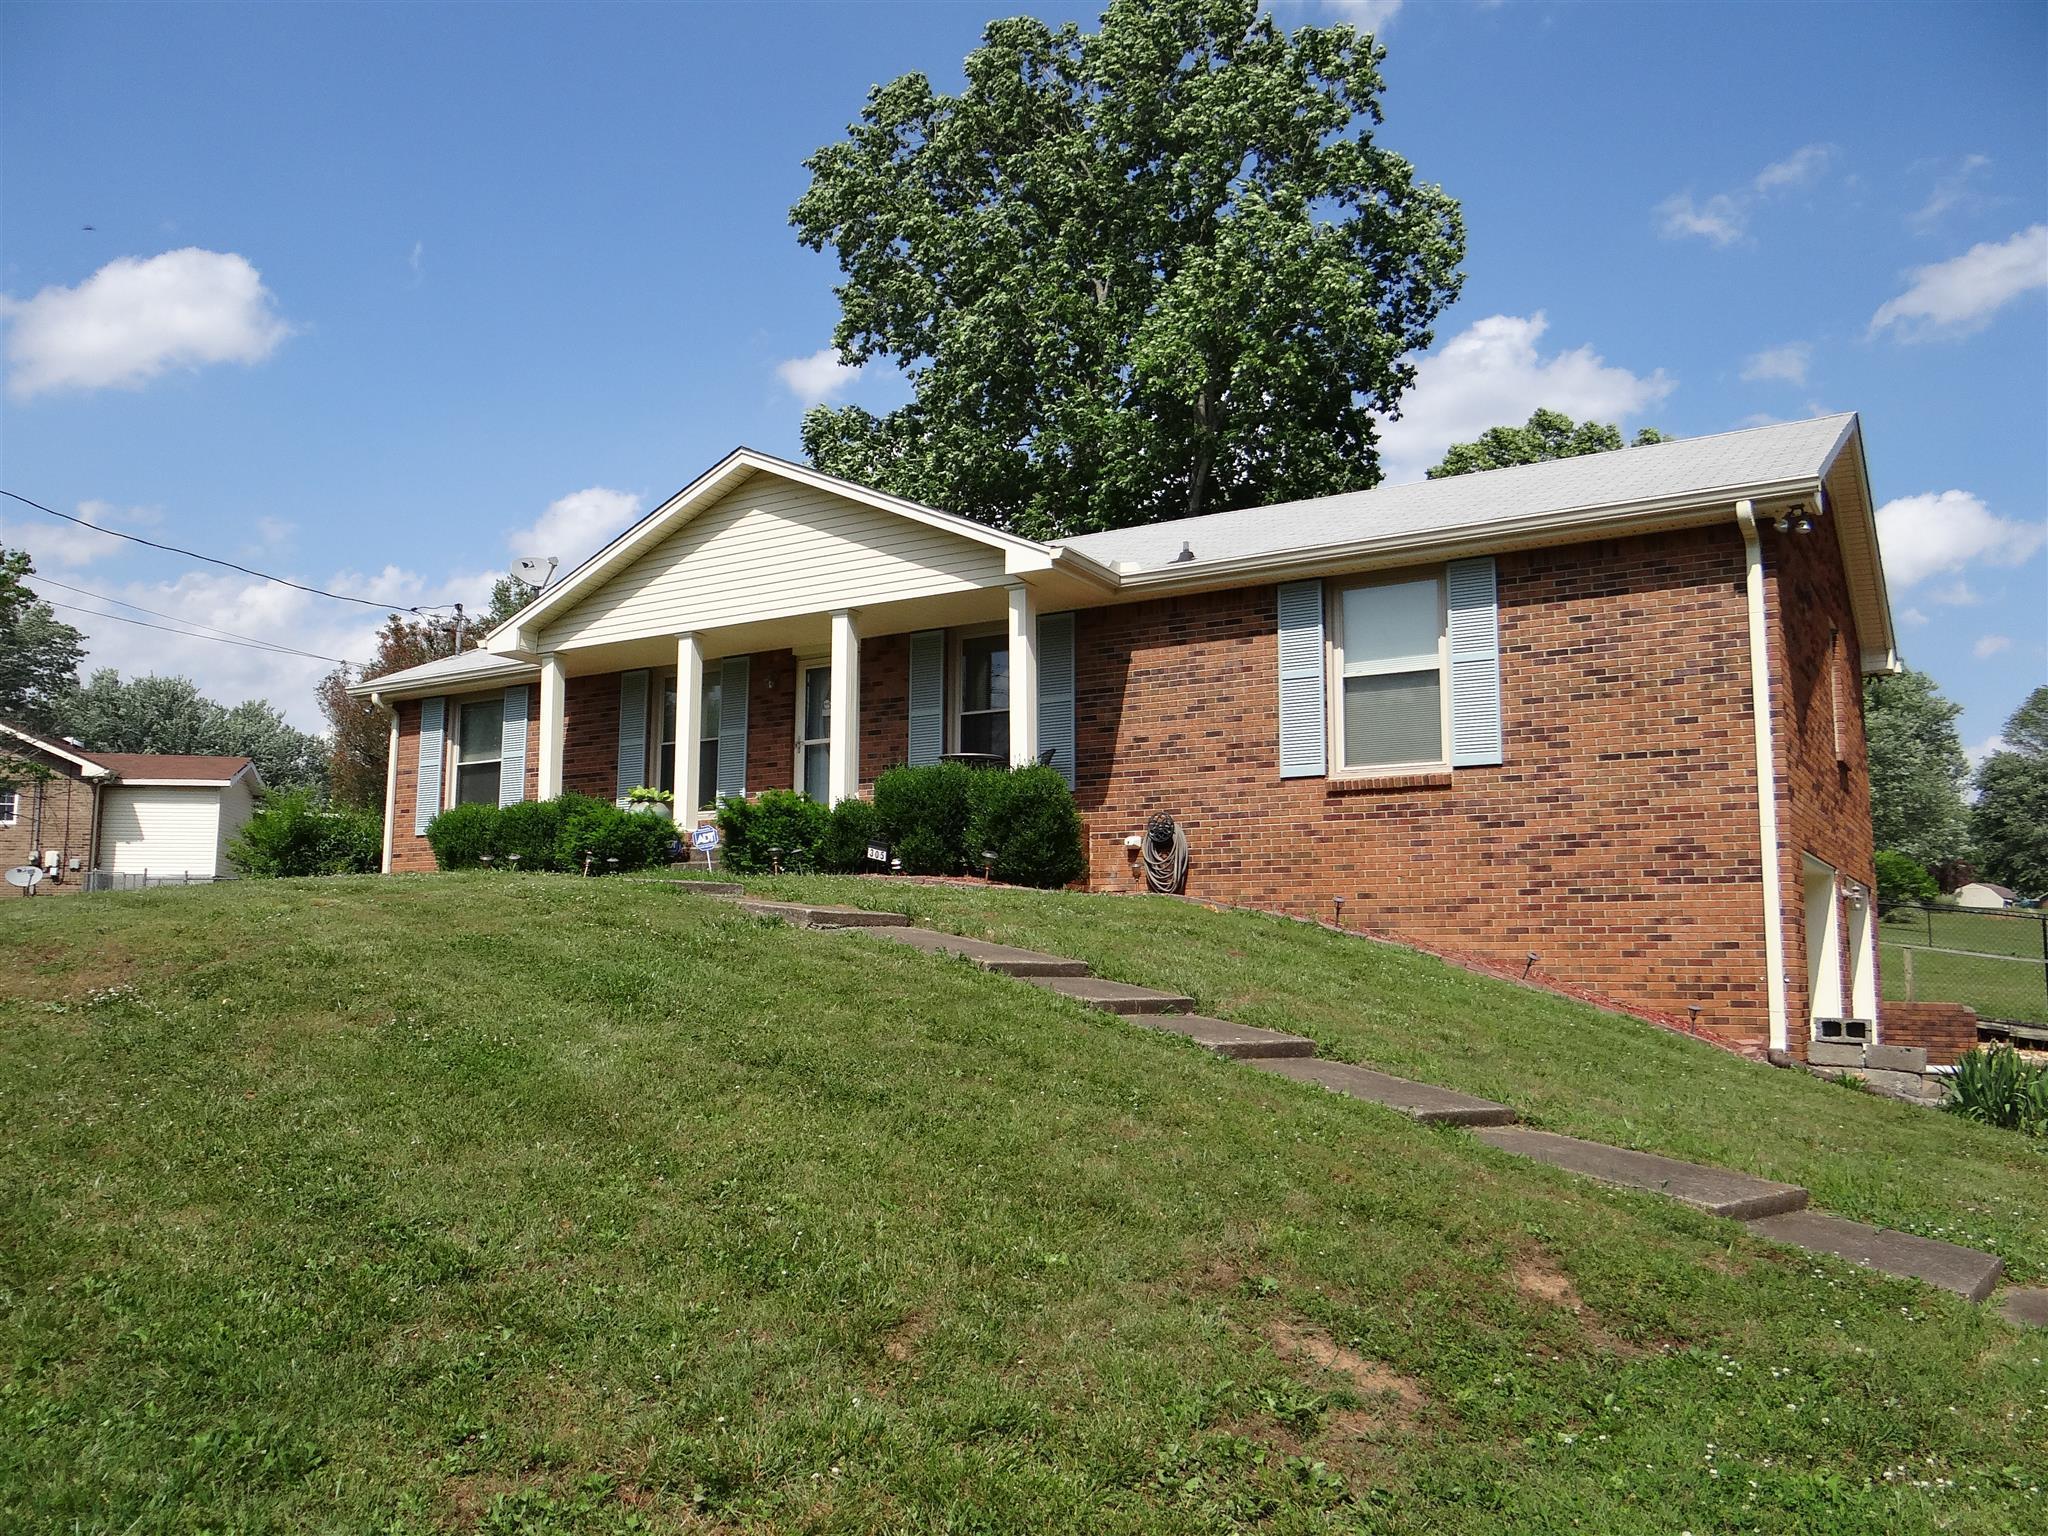 305 Justice Dr, Clarksville, TN 37043 (MLS #RTC2044547) :: Hannah Price Team